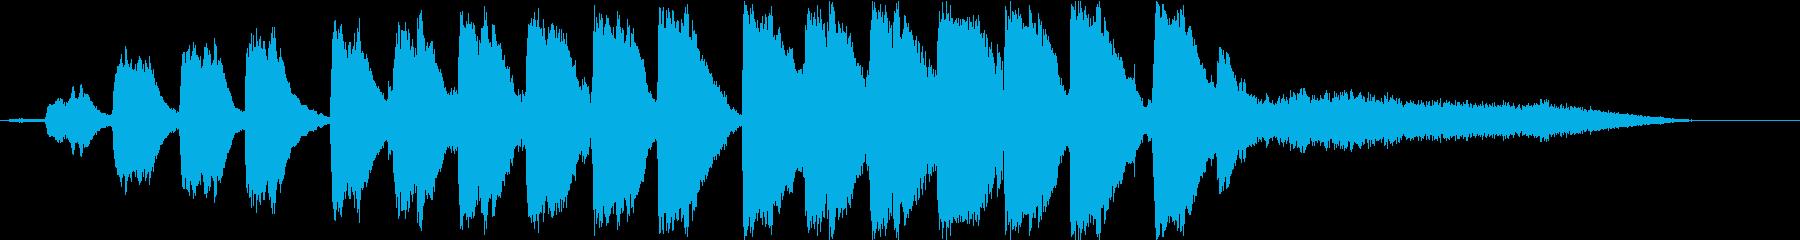 soonの再生済みの波形